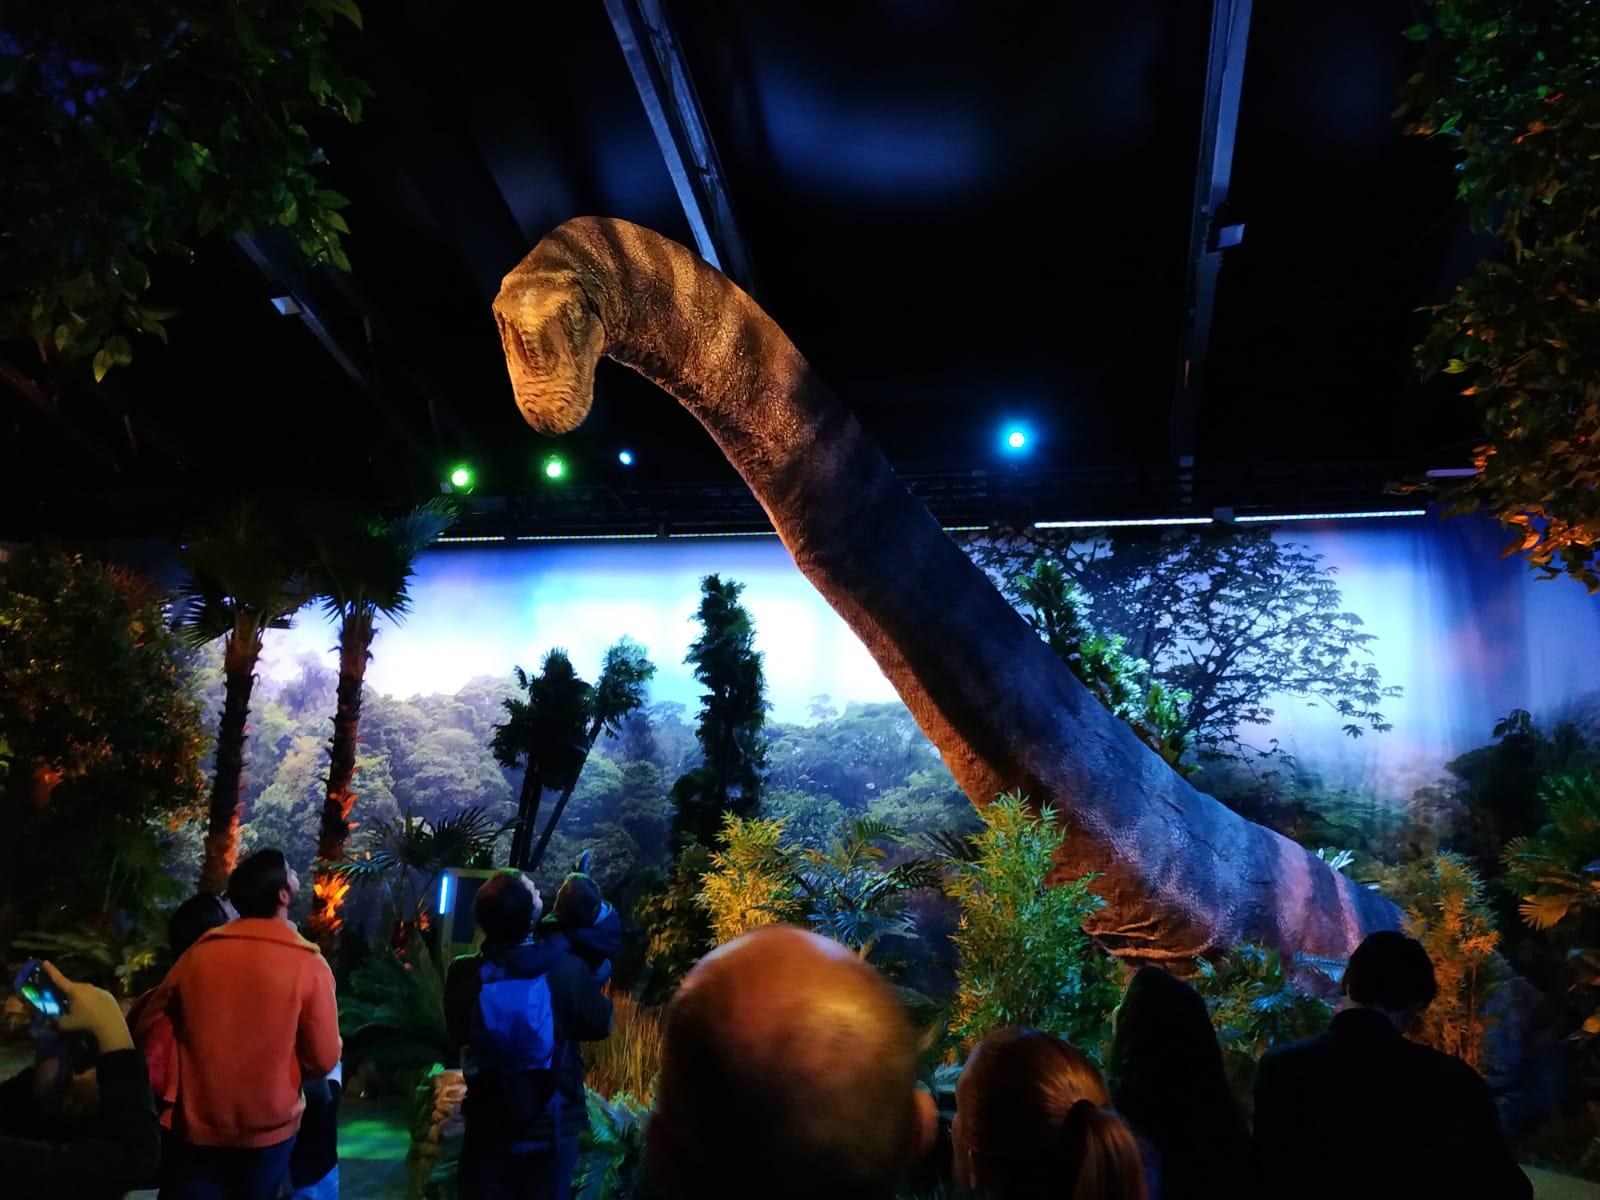 IMG 20190203 WA0027 - Visita a Jurassic World Exhibition en Madrid